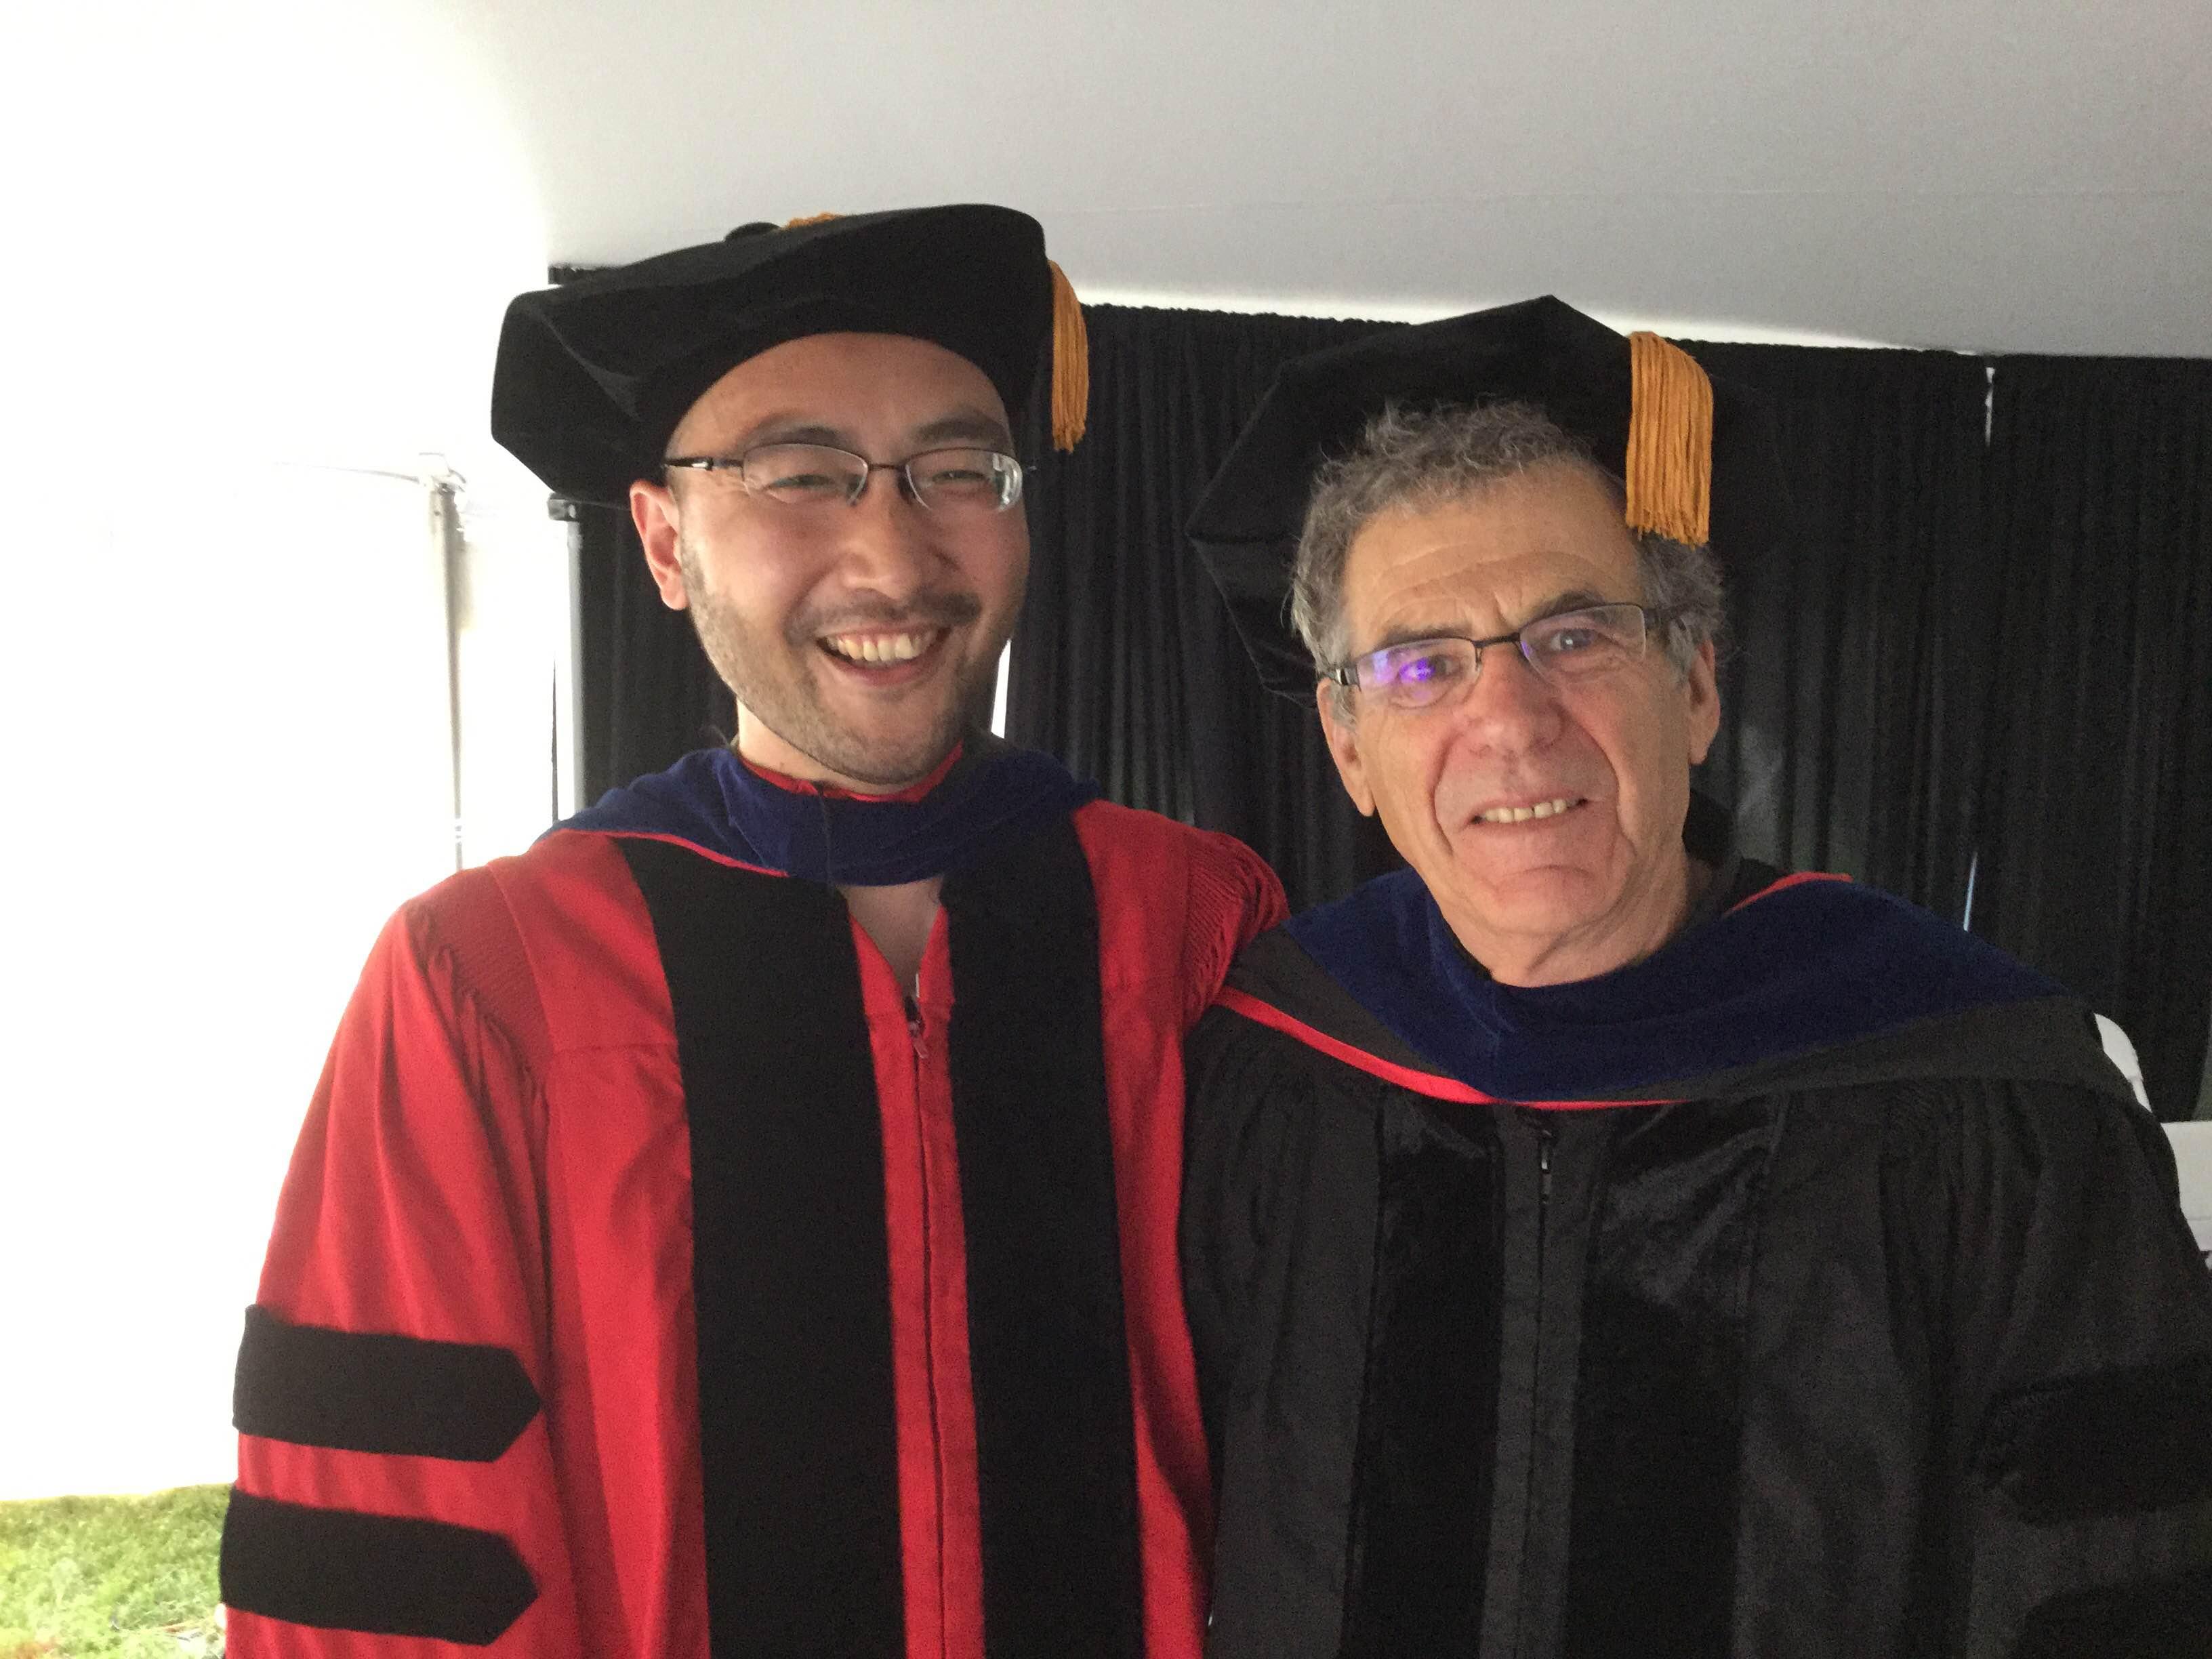 Congratulating a prof when students graduate?